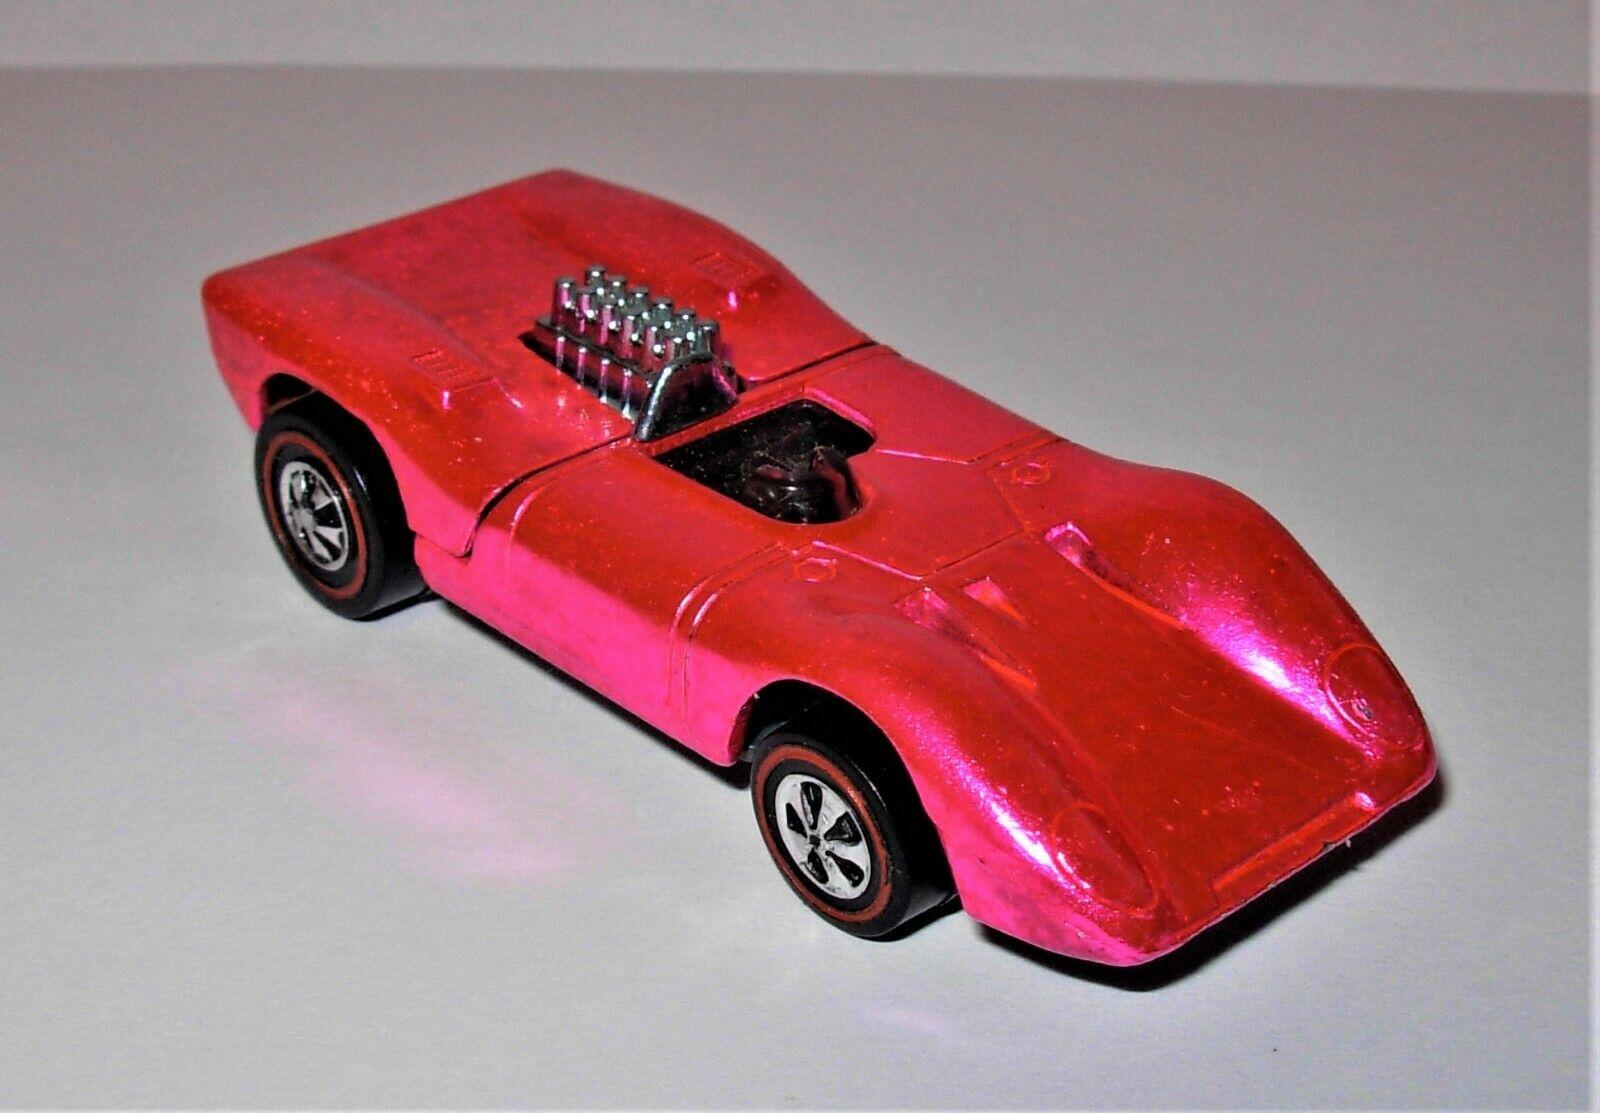 Nucléaire Hot wheels rougeline  FERRARI 312P  Blazing Rose Chaud USA